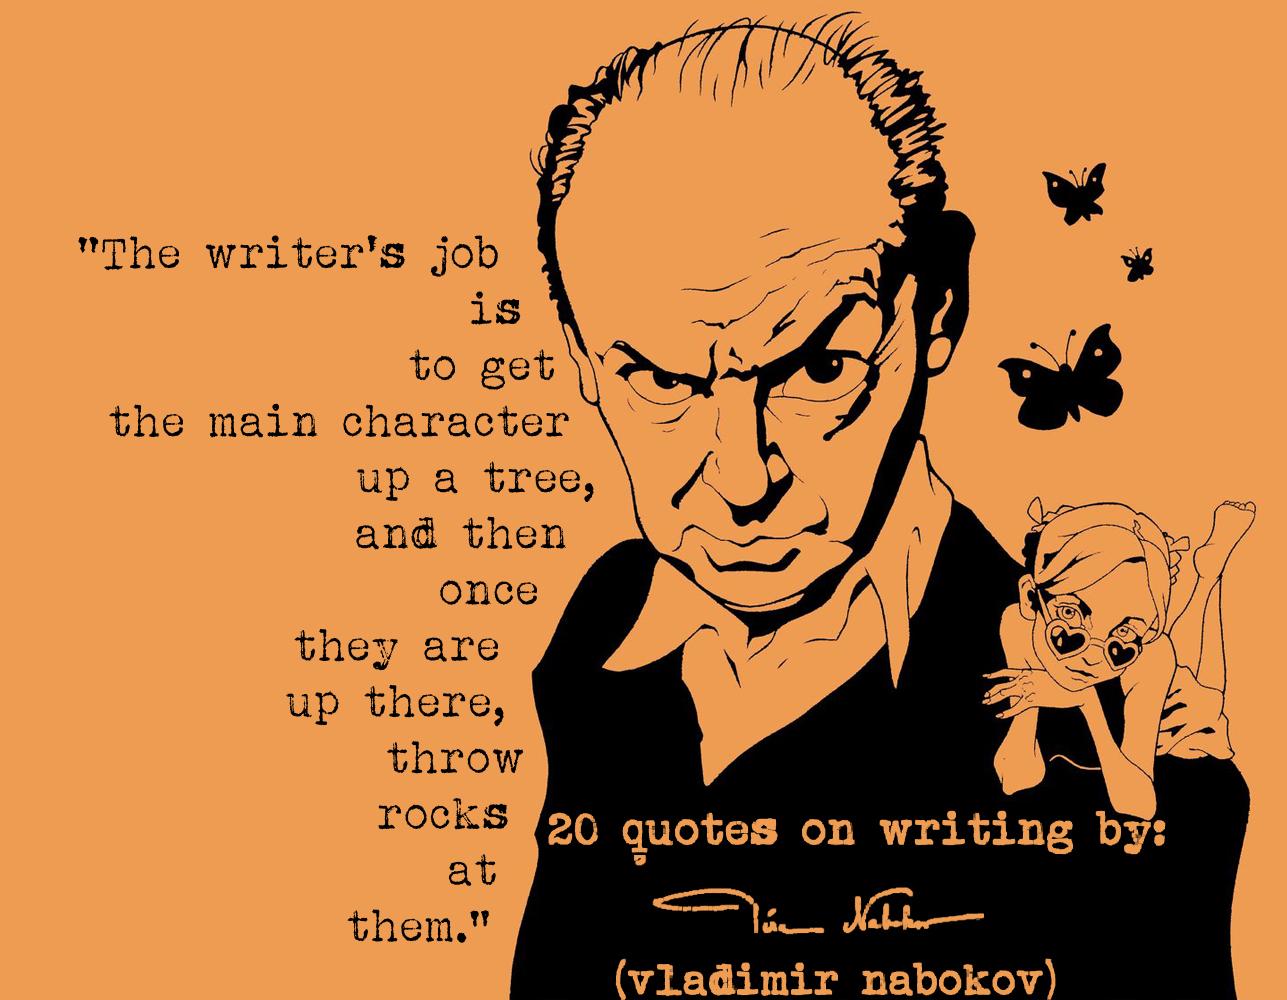 Vladimir Nabokov's quote #2